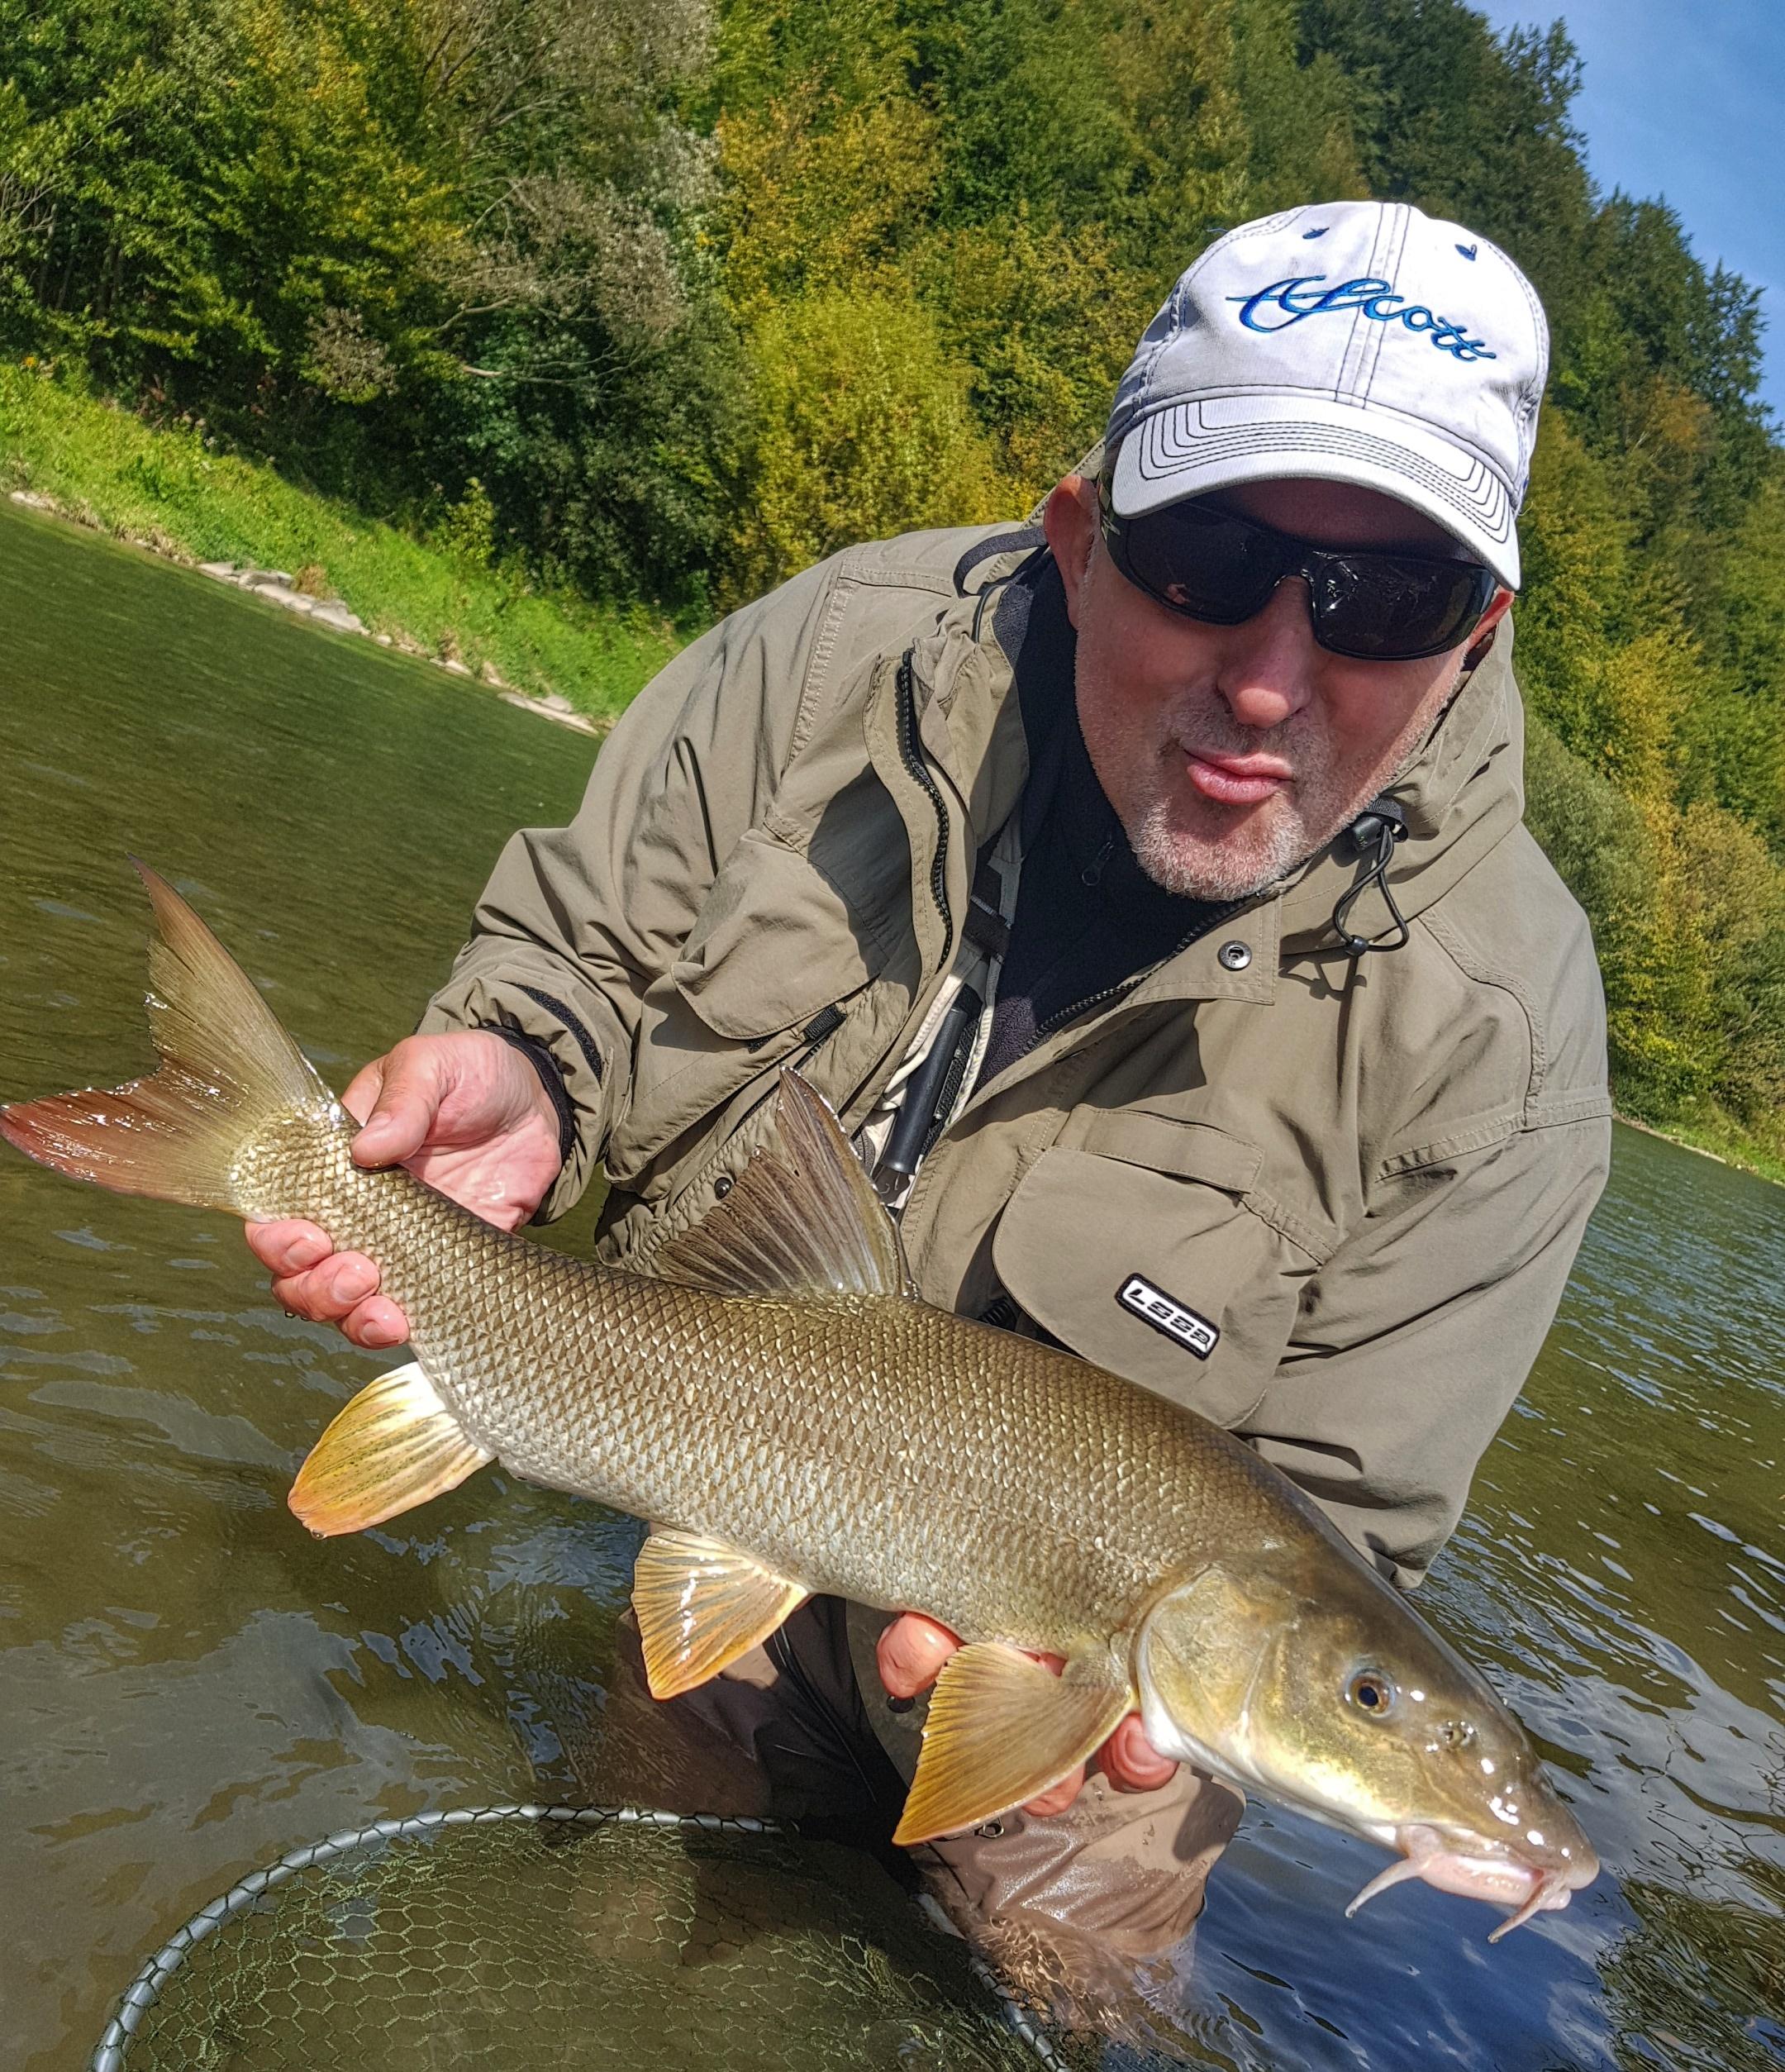 Loop equipement fishing for barbel. Poprad River - Poland